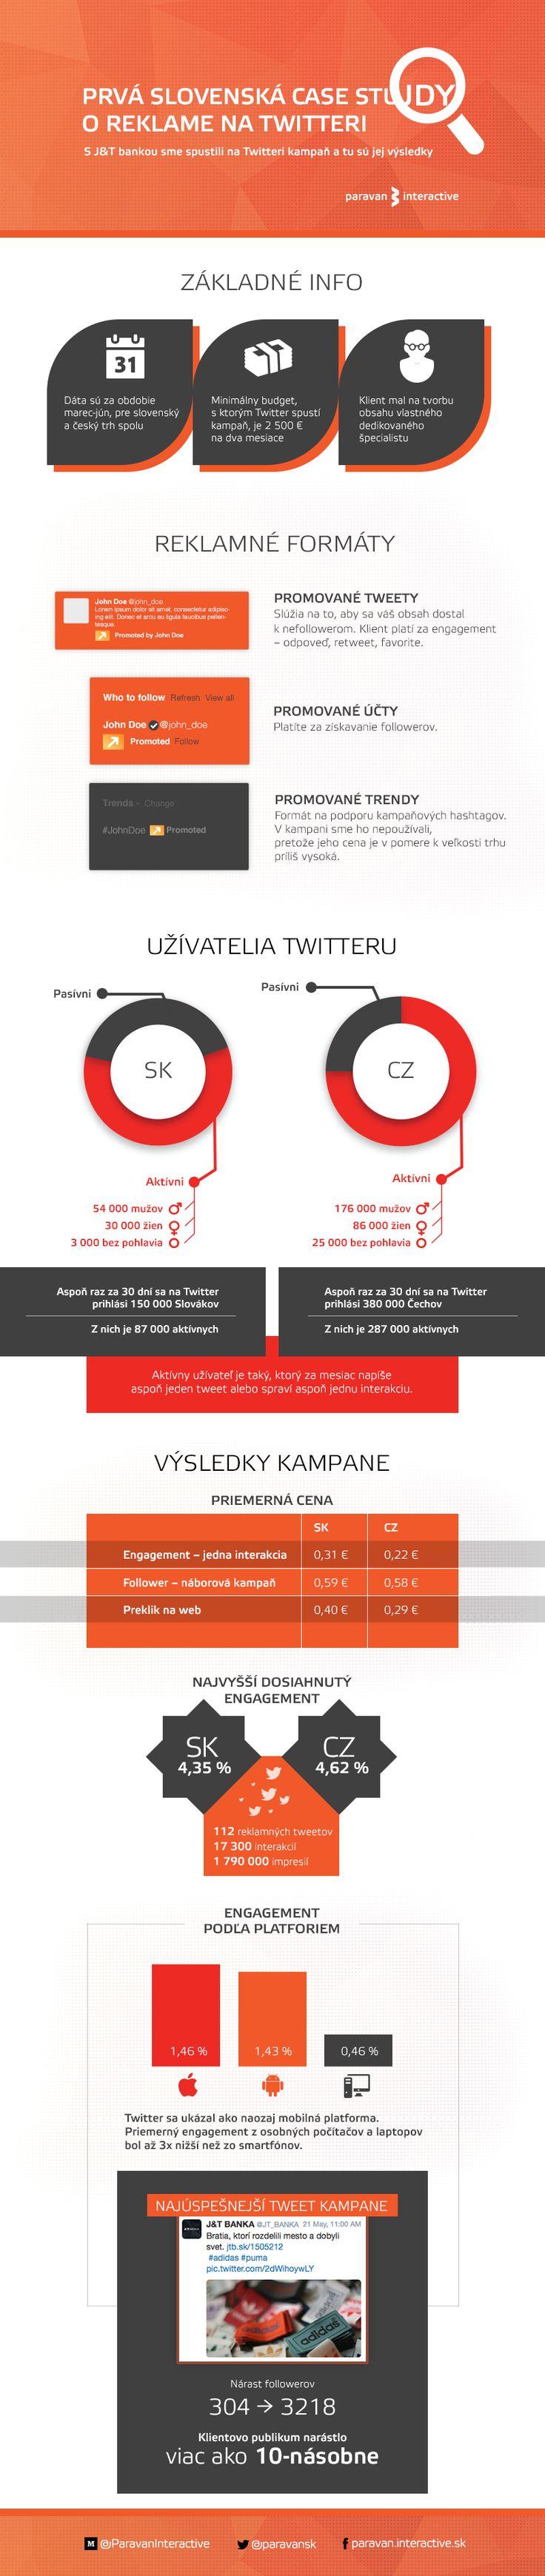 Prvá slovenská case study o reklame na Twitteri